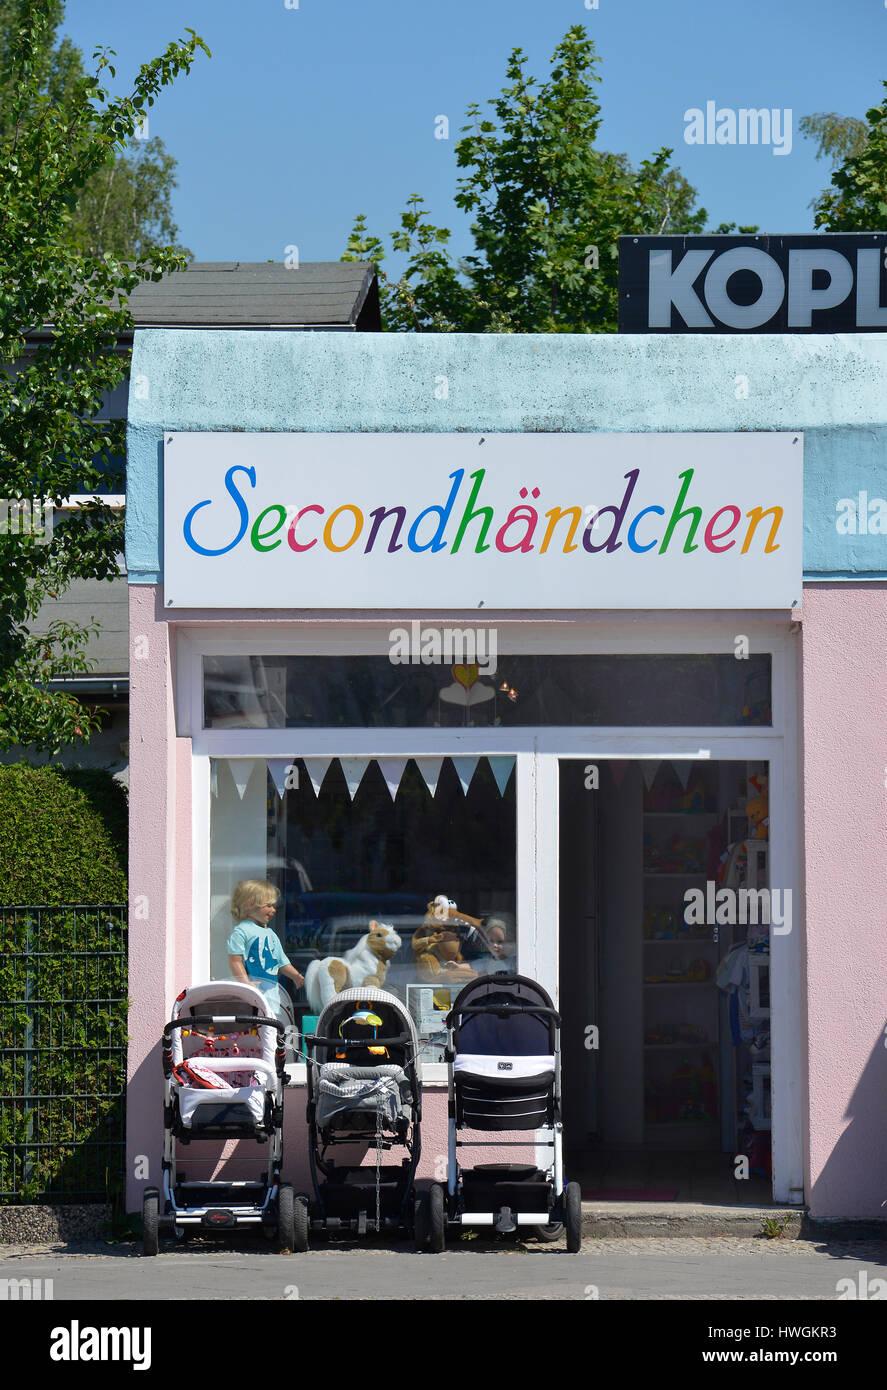 Kinder Secondhand, Brunsbuetteler Damm, Spandau, Berlin, Deutschland, Brunsb³tteler Damm - Stock Image